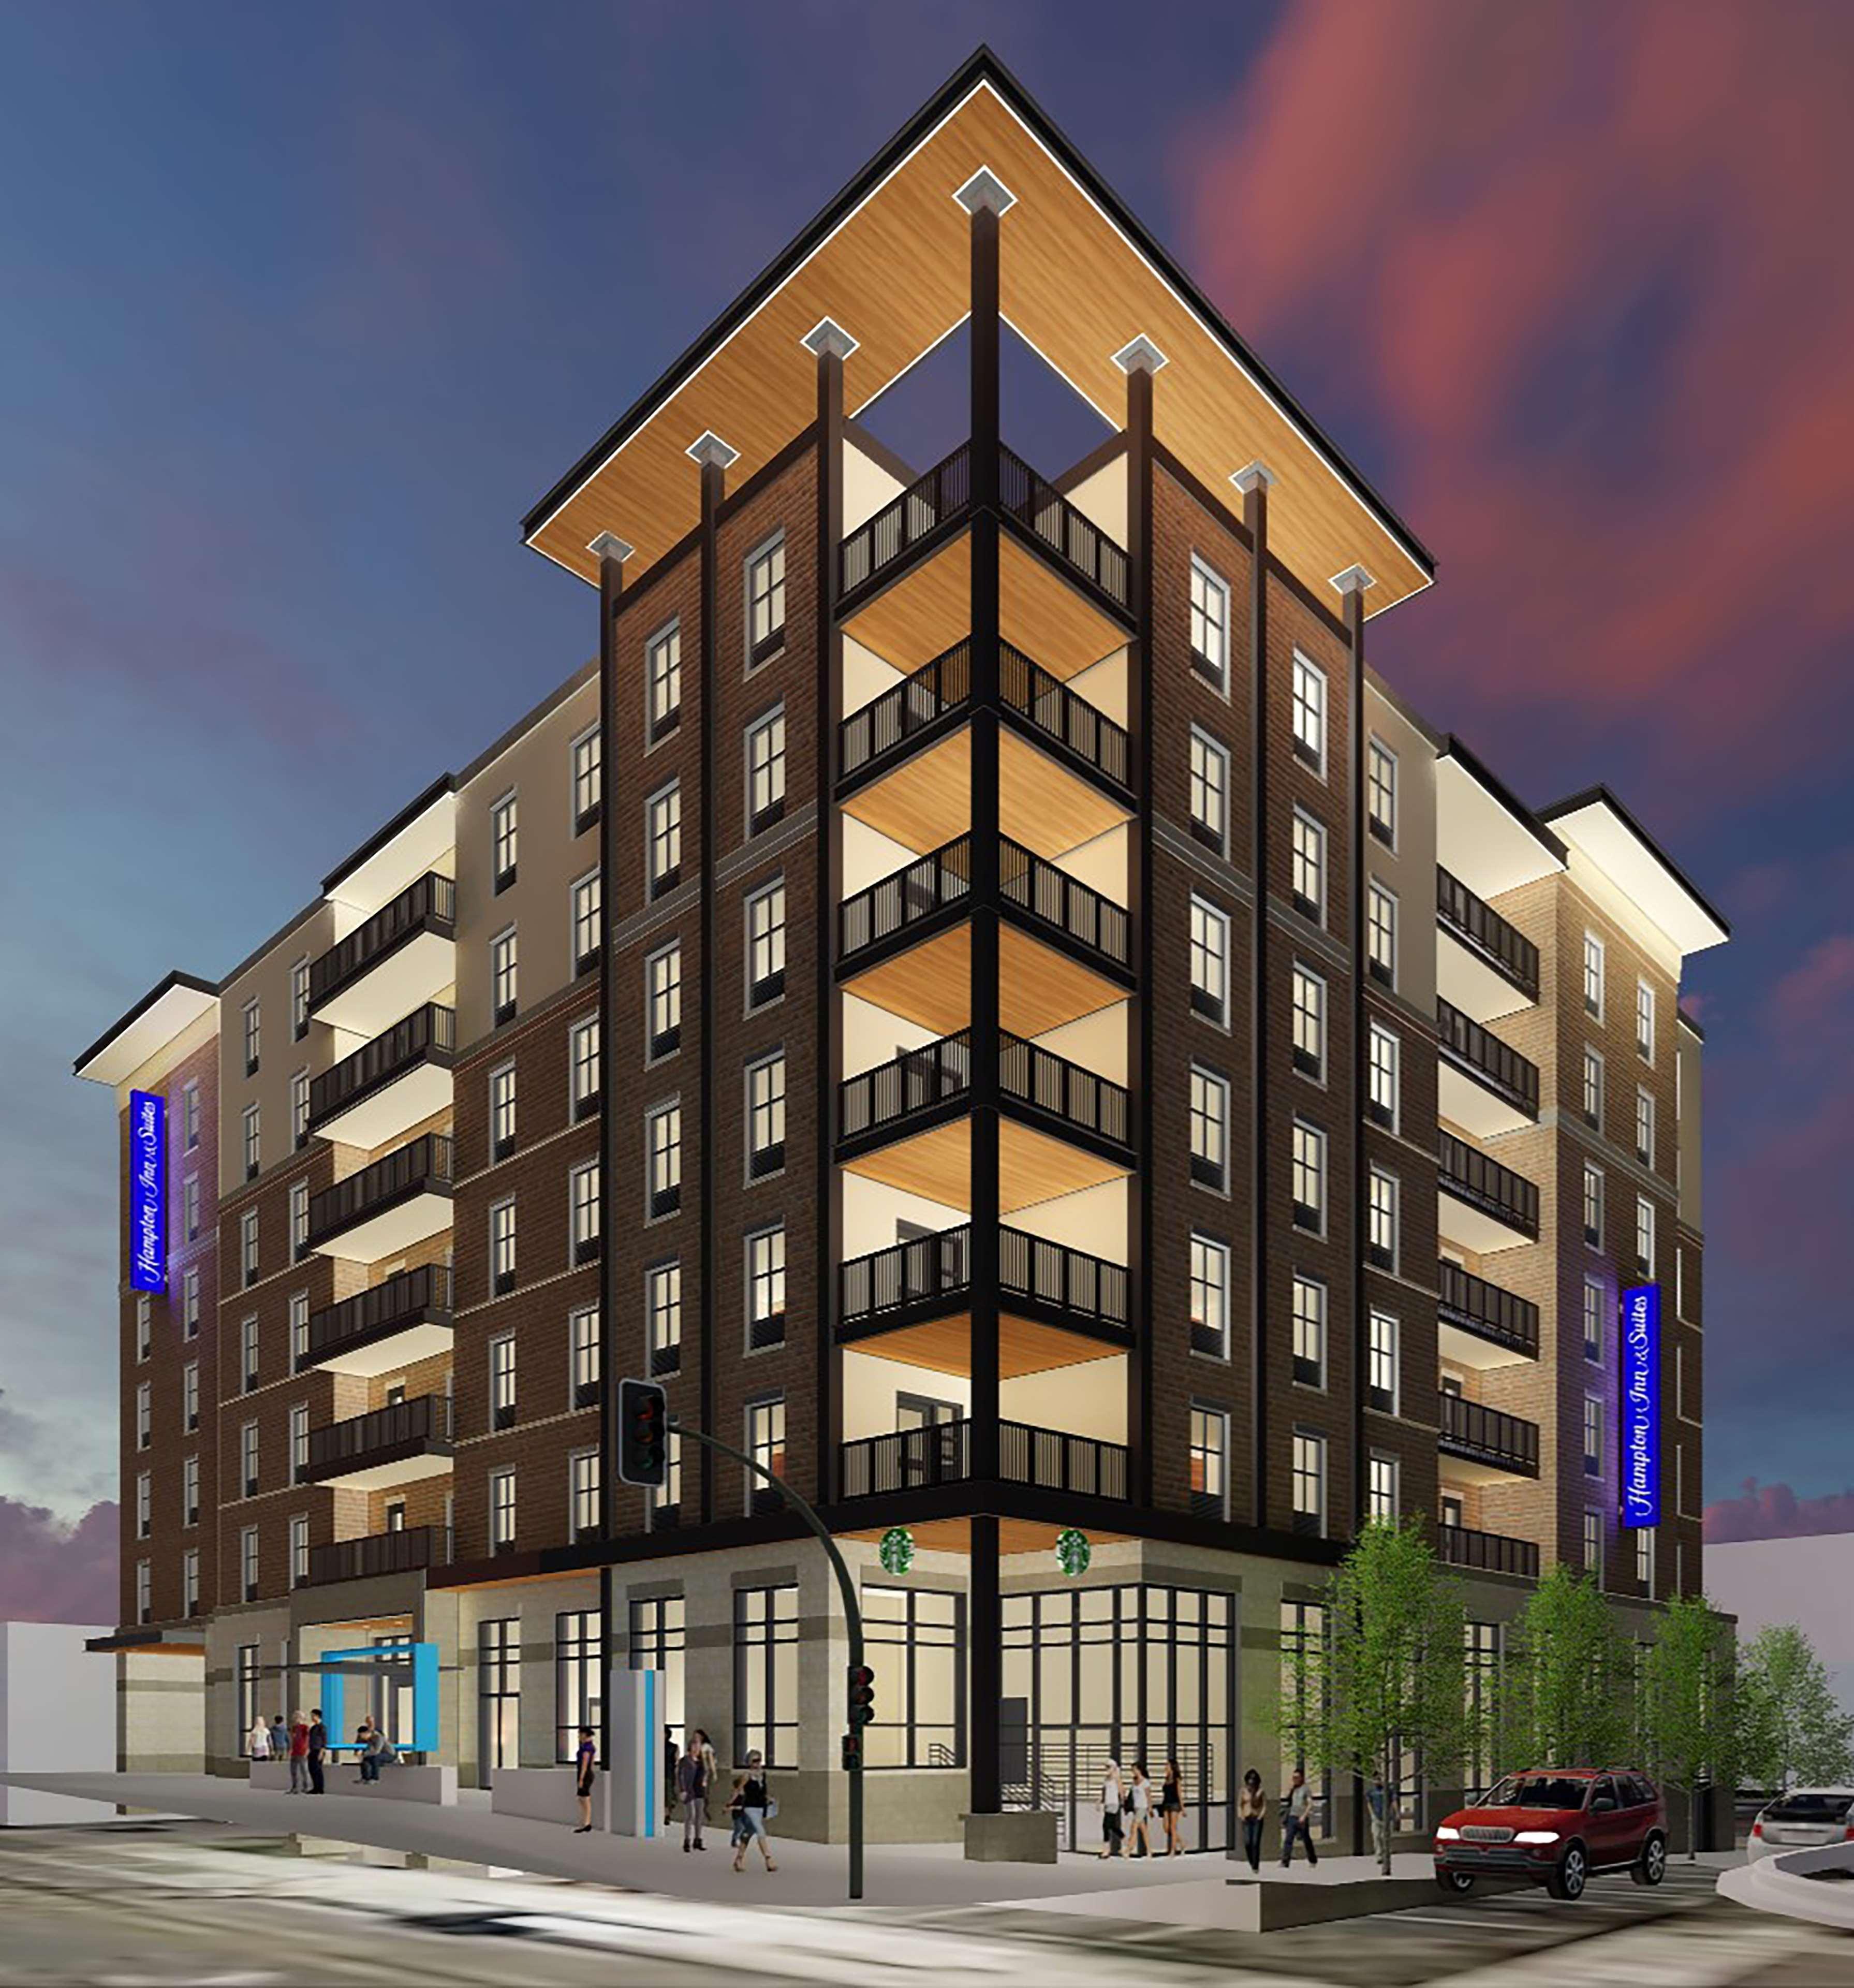 Hampton Inn and Suites Kansas City Downtown Crossroads image 0